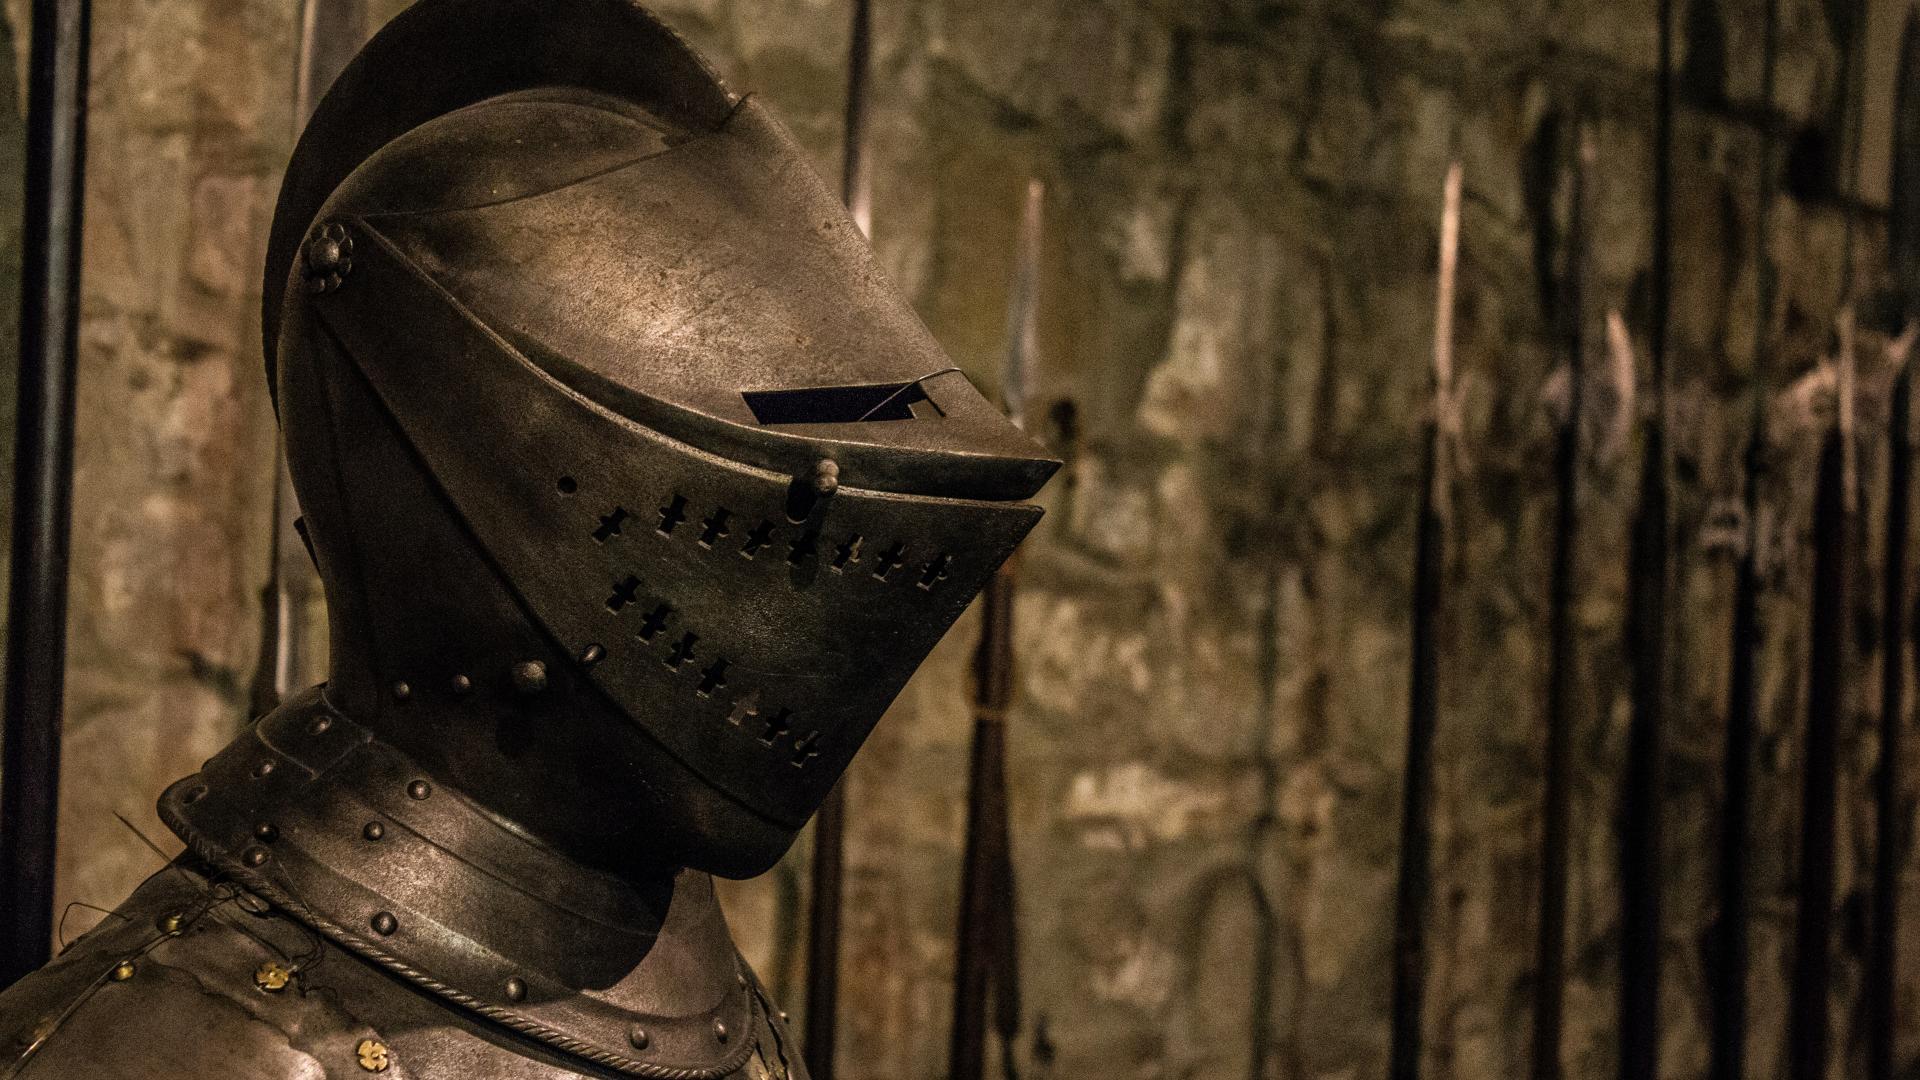 Ritter Ausrüstung Mittelalter